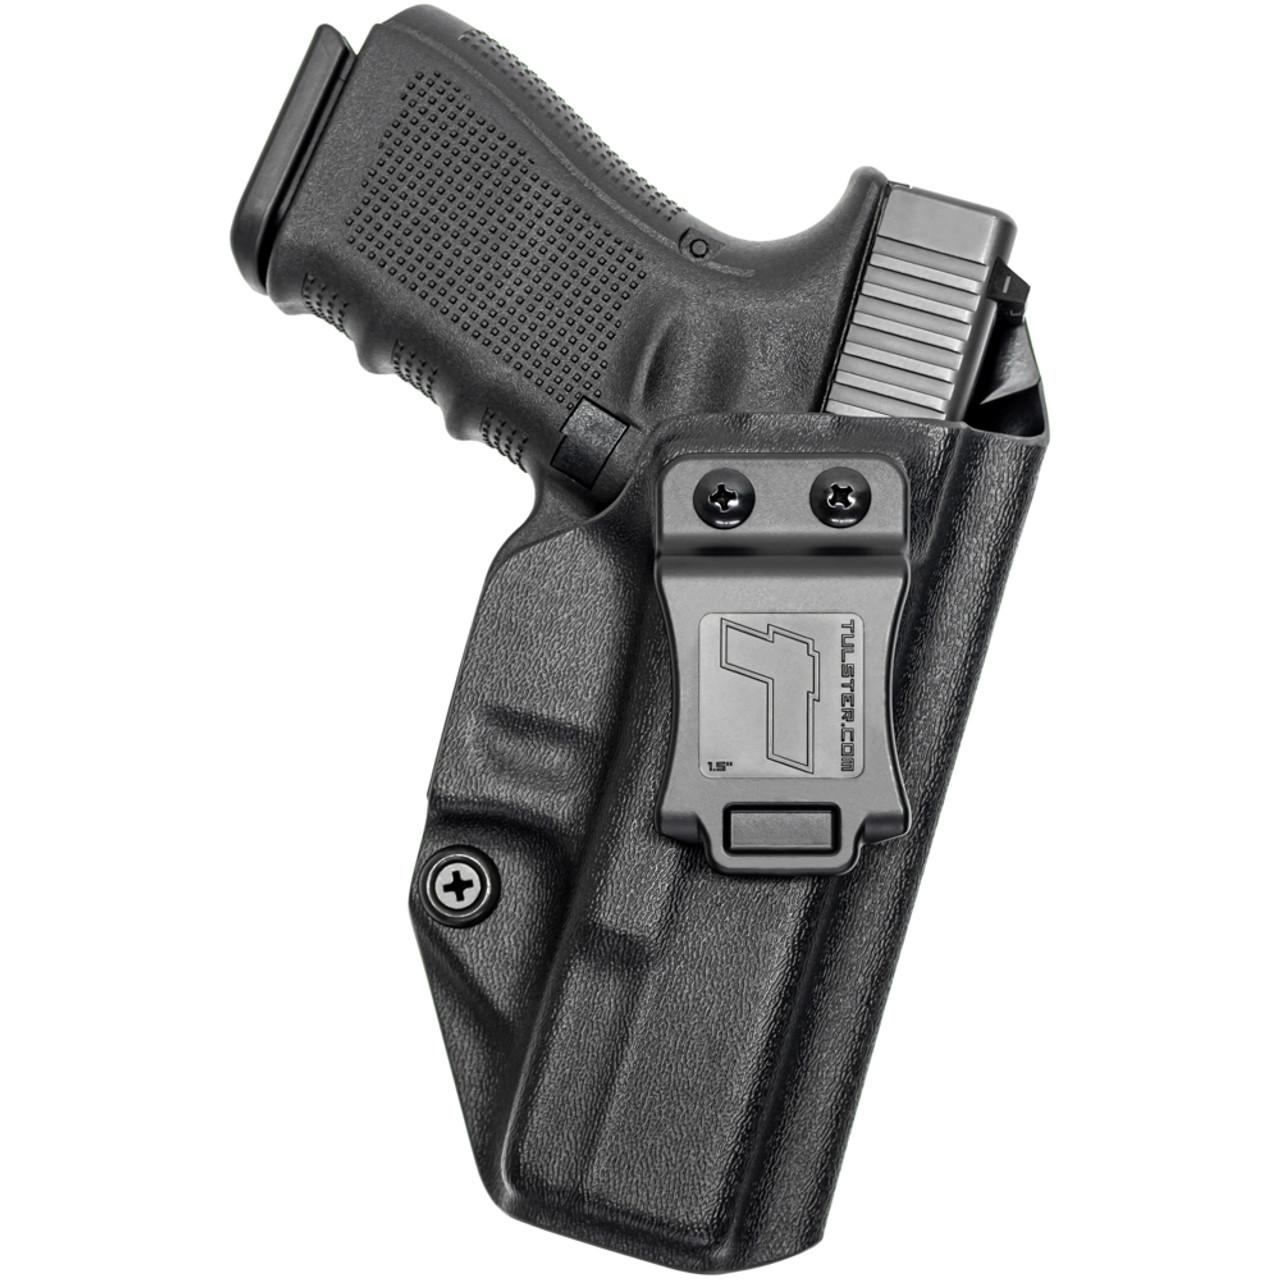 Glock 19/19X/23/25/32/44/45 - Profile IWB Holster - Right Hand